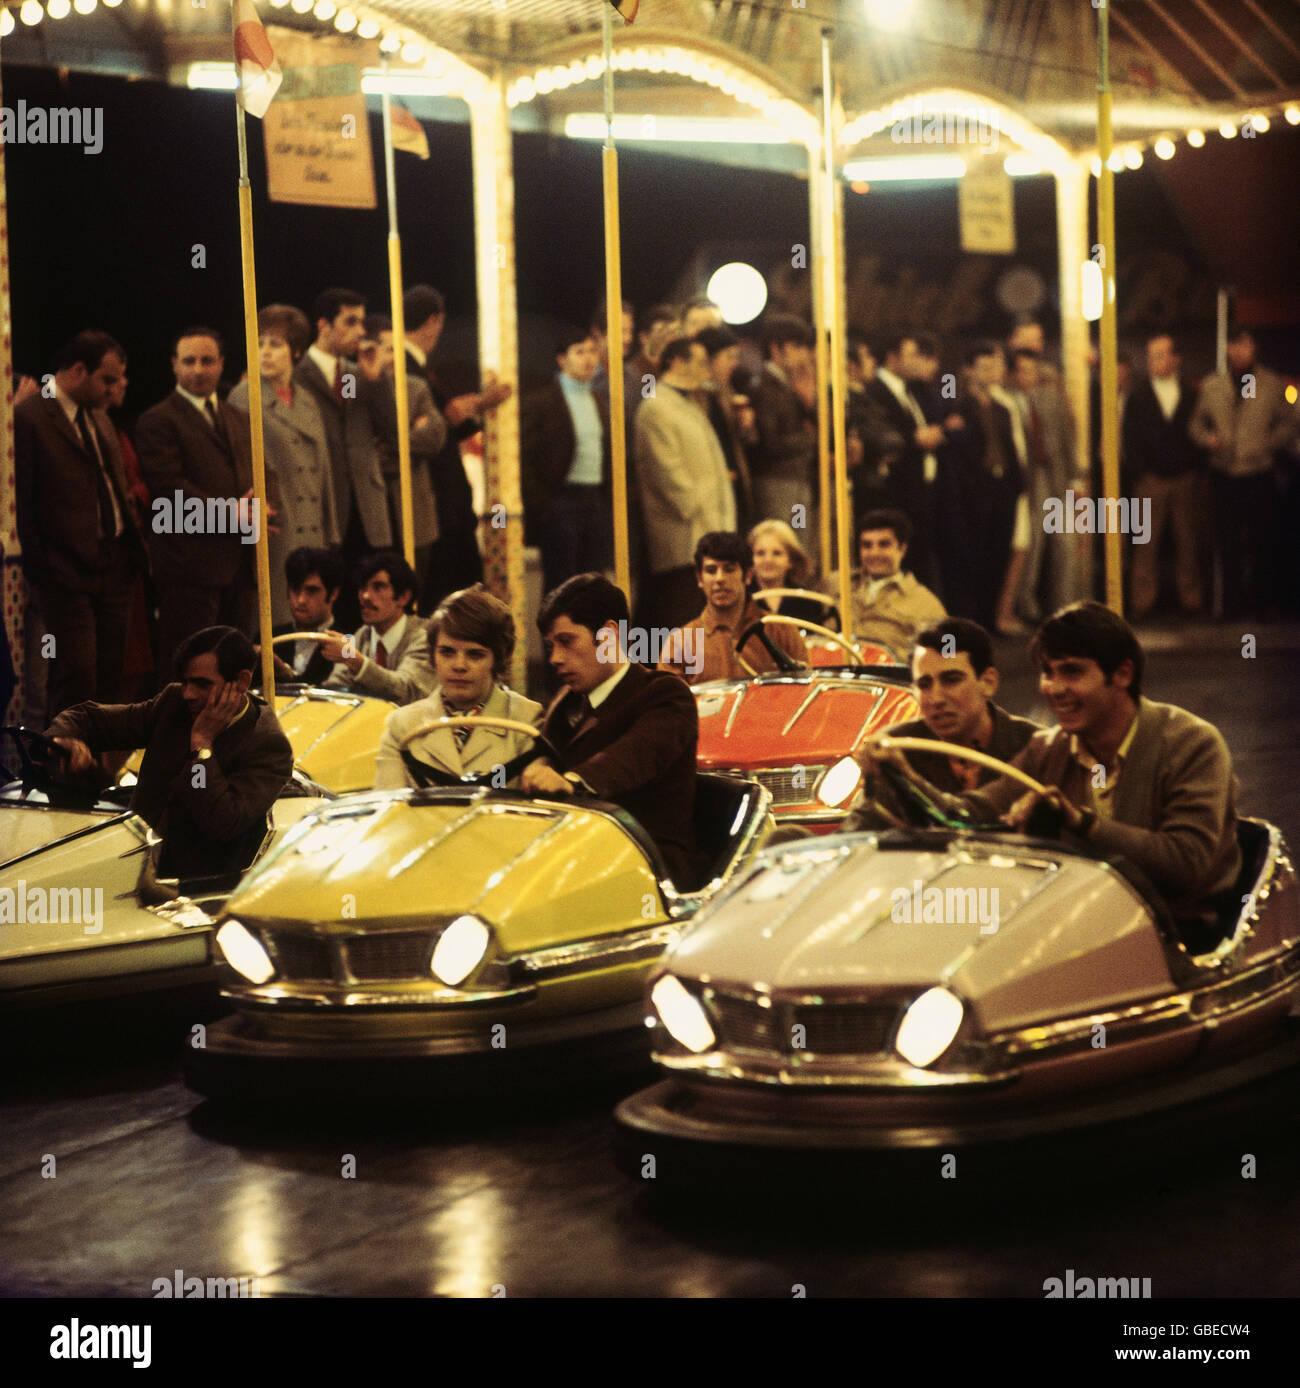 Fiesta, feria, feria, el coche de parachoques, 1960, 60s del siglo XX, histórico, histórico, festival Imagen De Stock